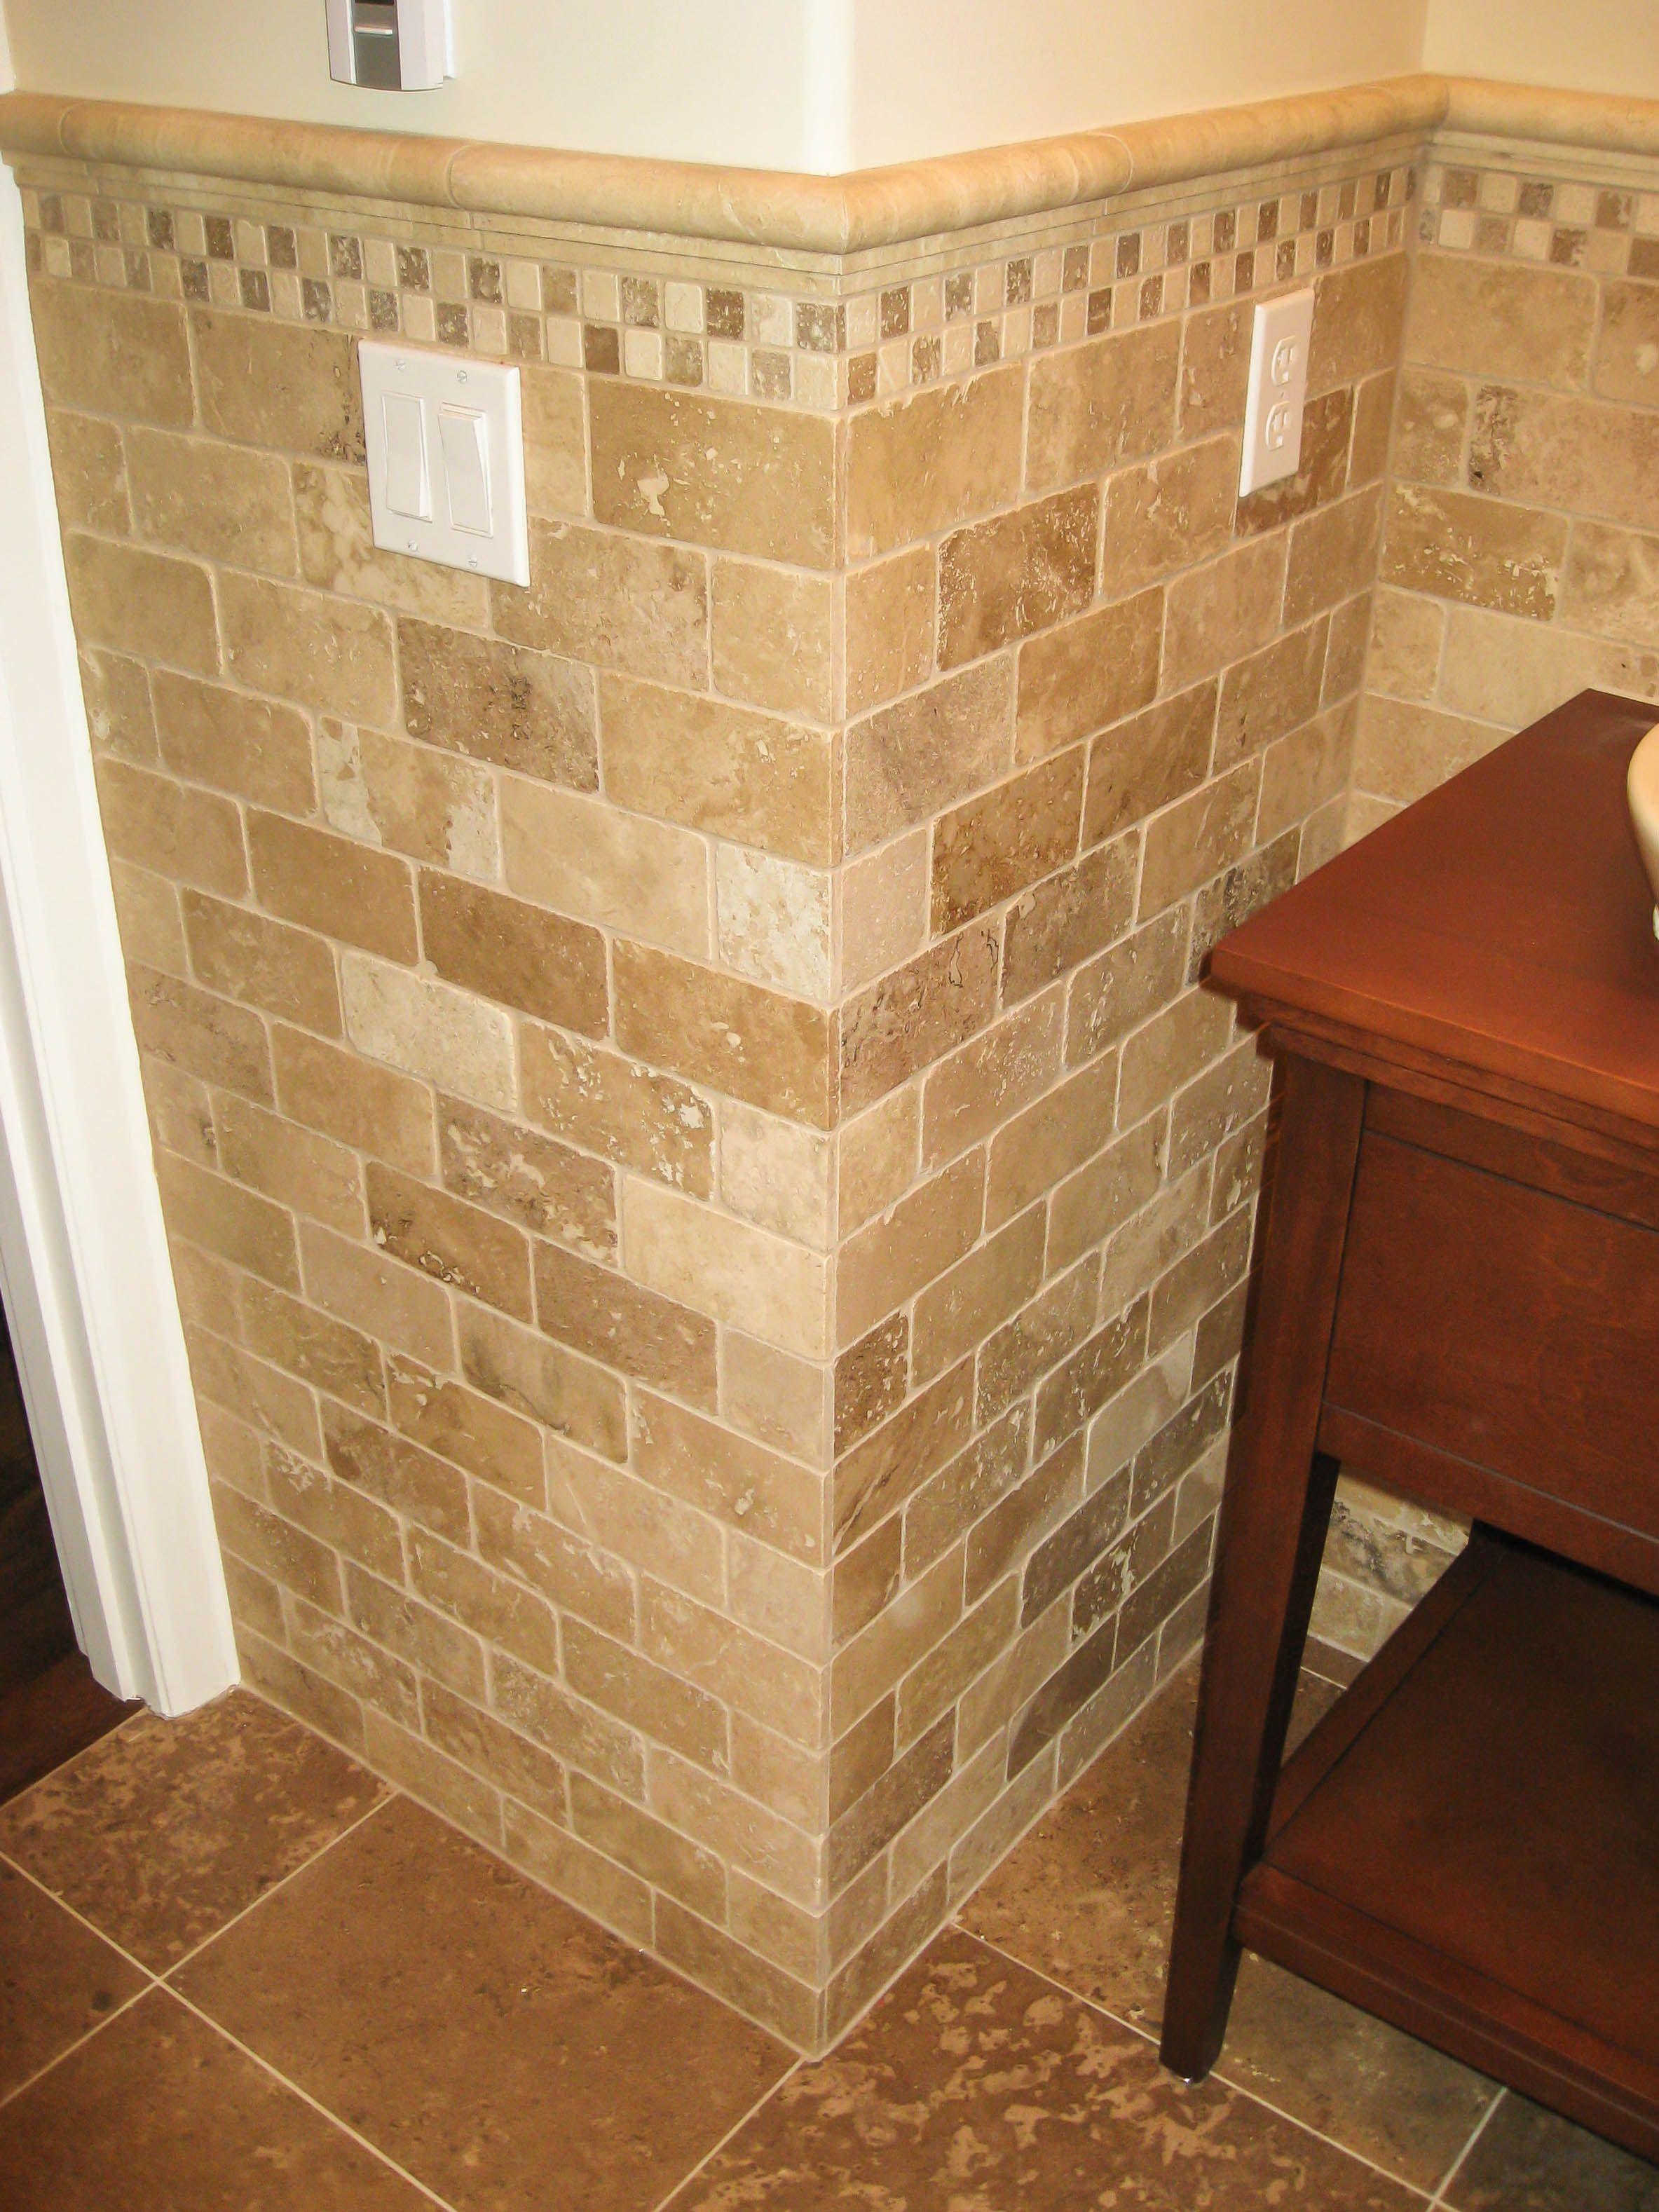 Bathroom tile wainscoting | ideas | Pinterest | Bathroom, Tile and ...